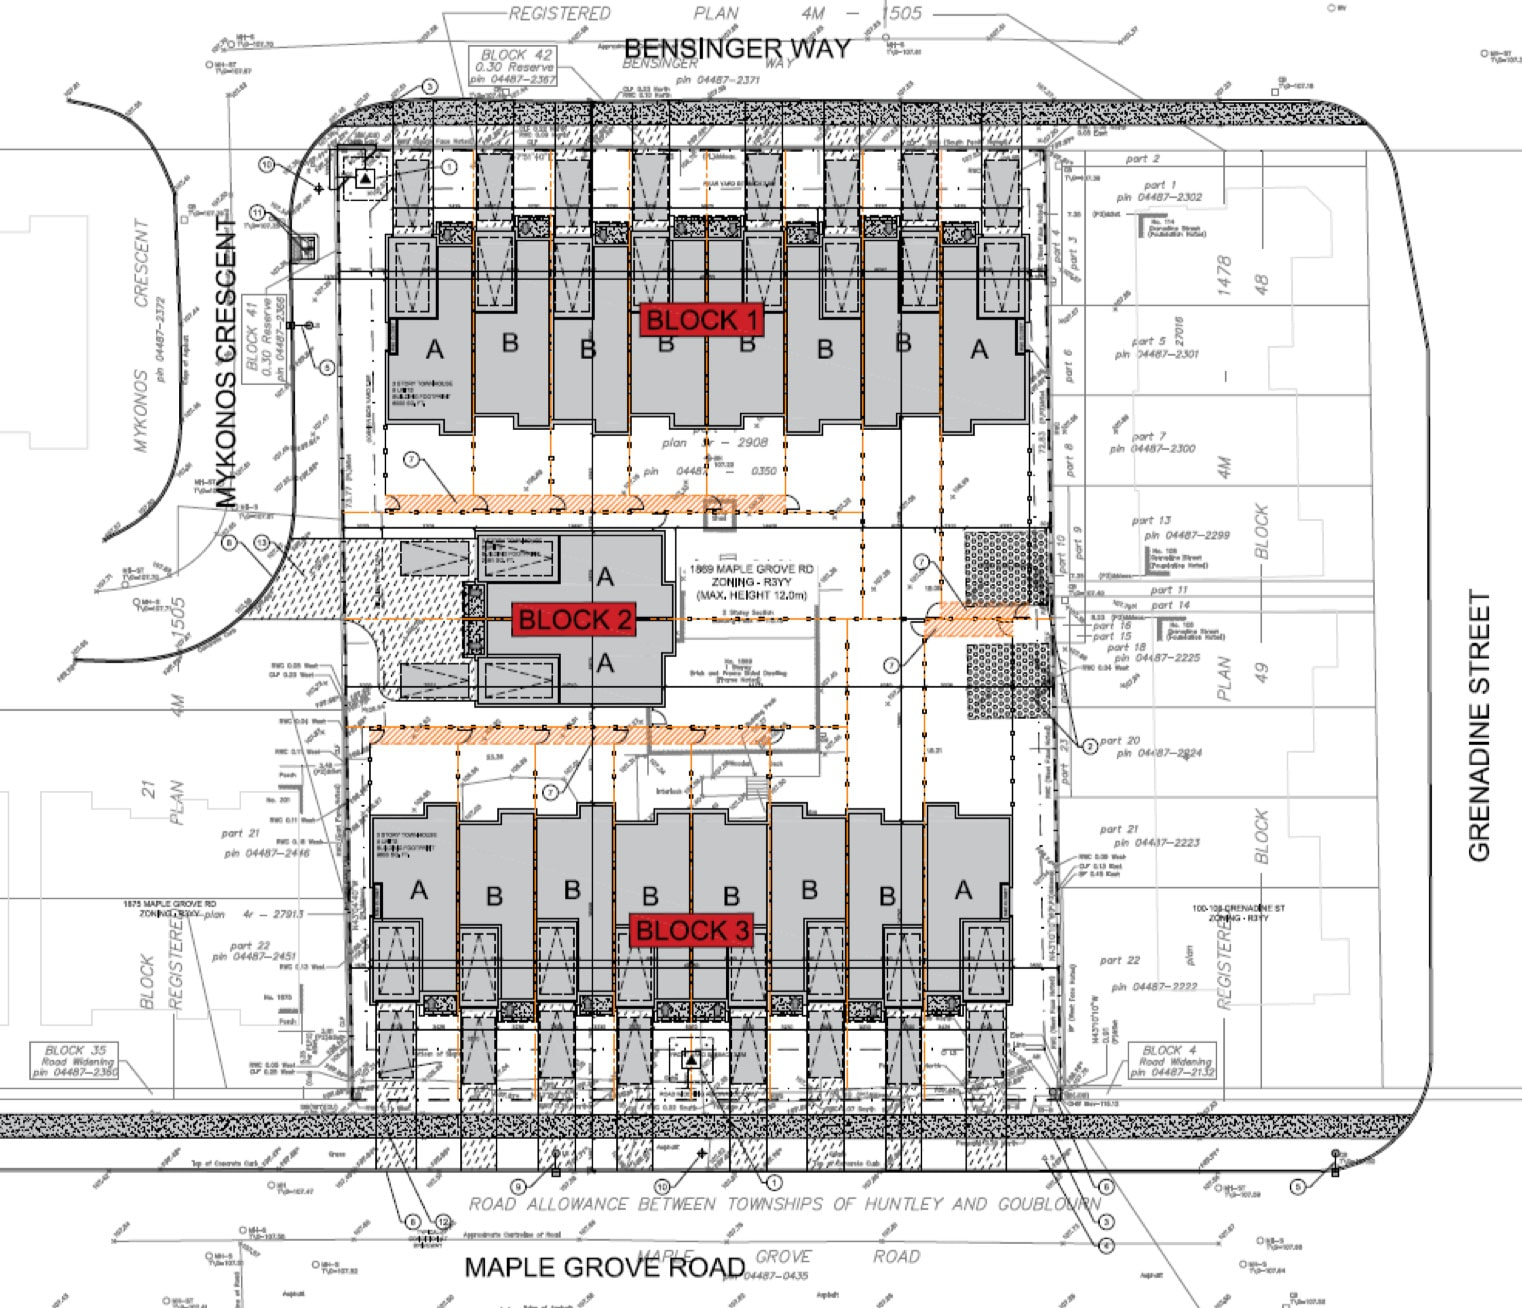 1869 Maple Grove plan of subdivision